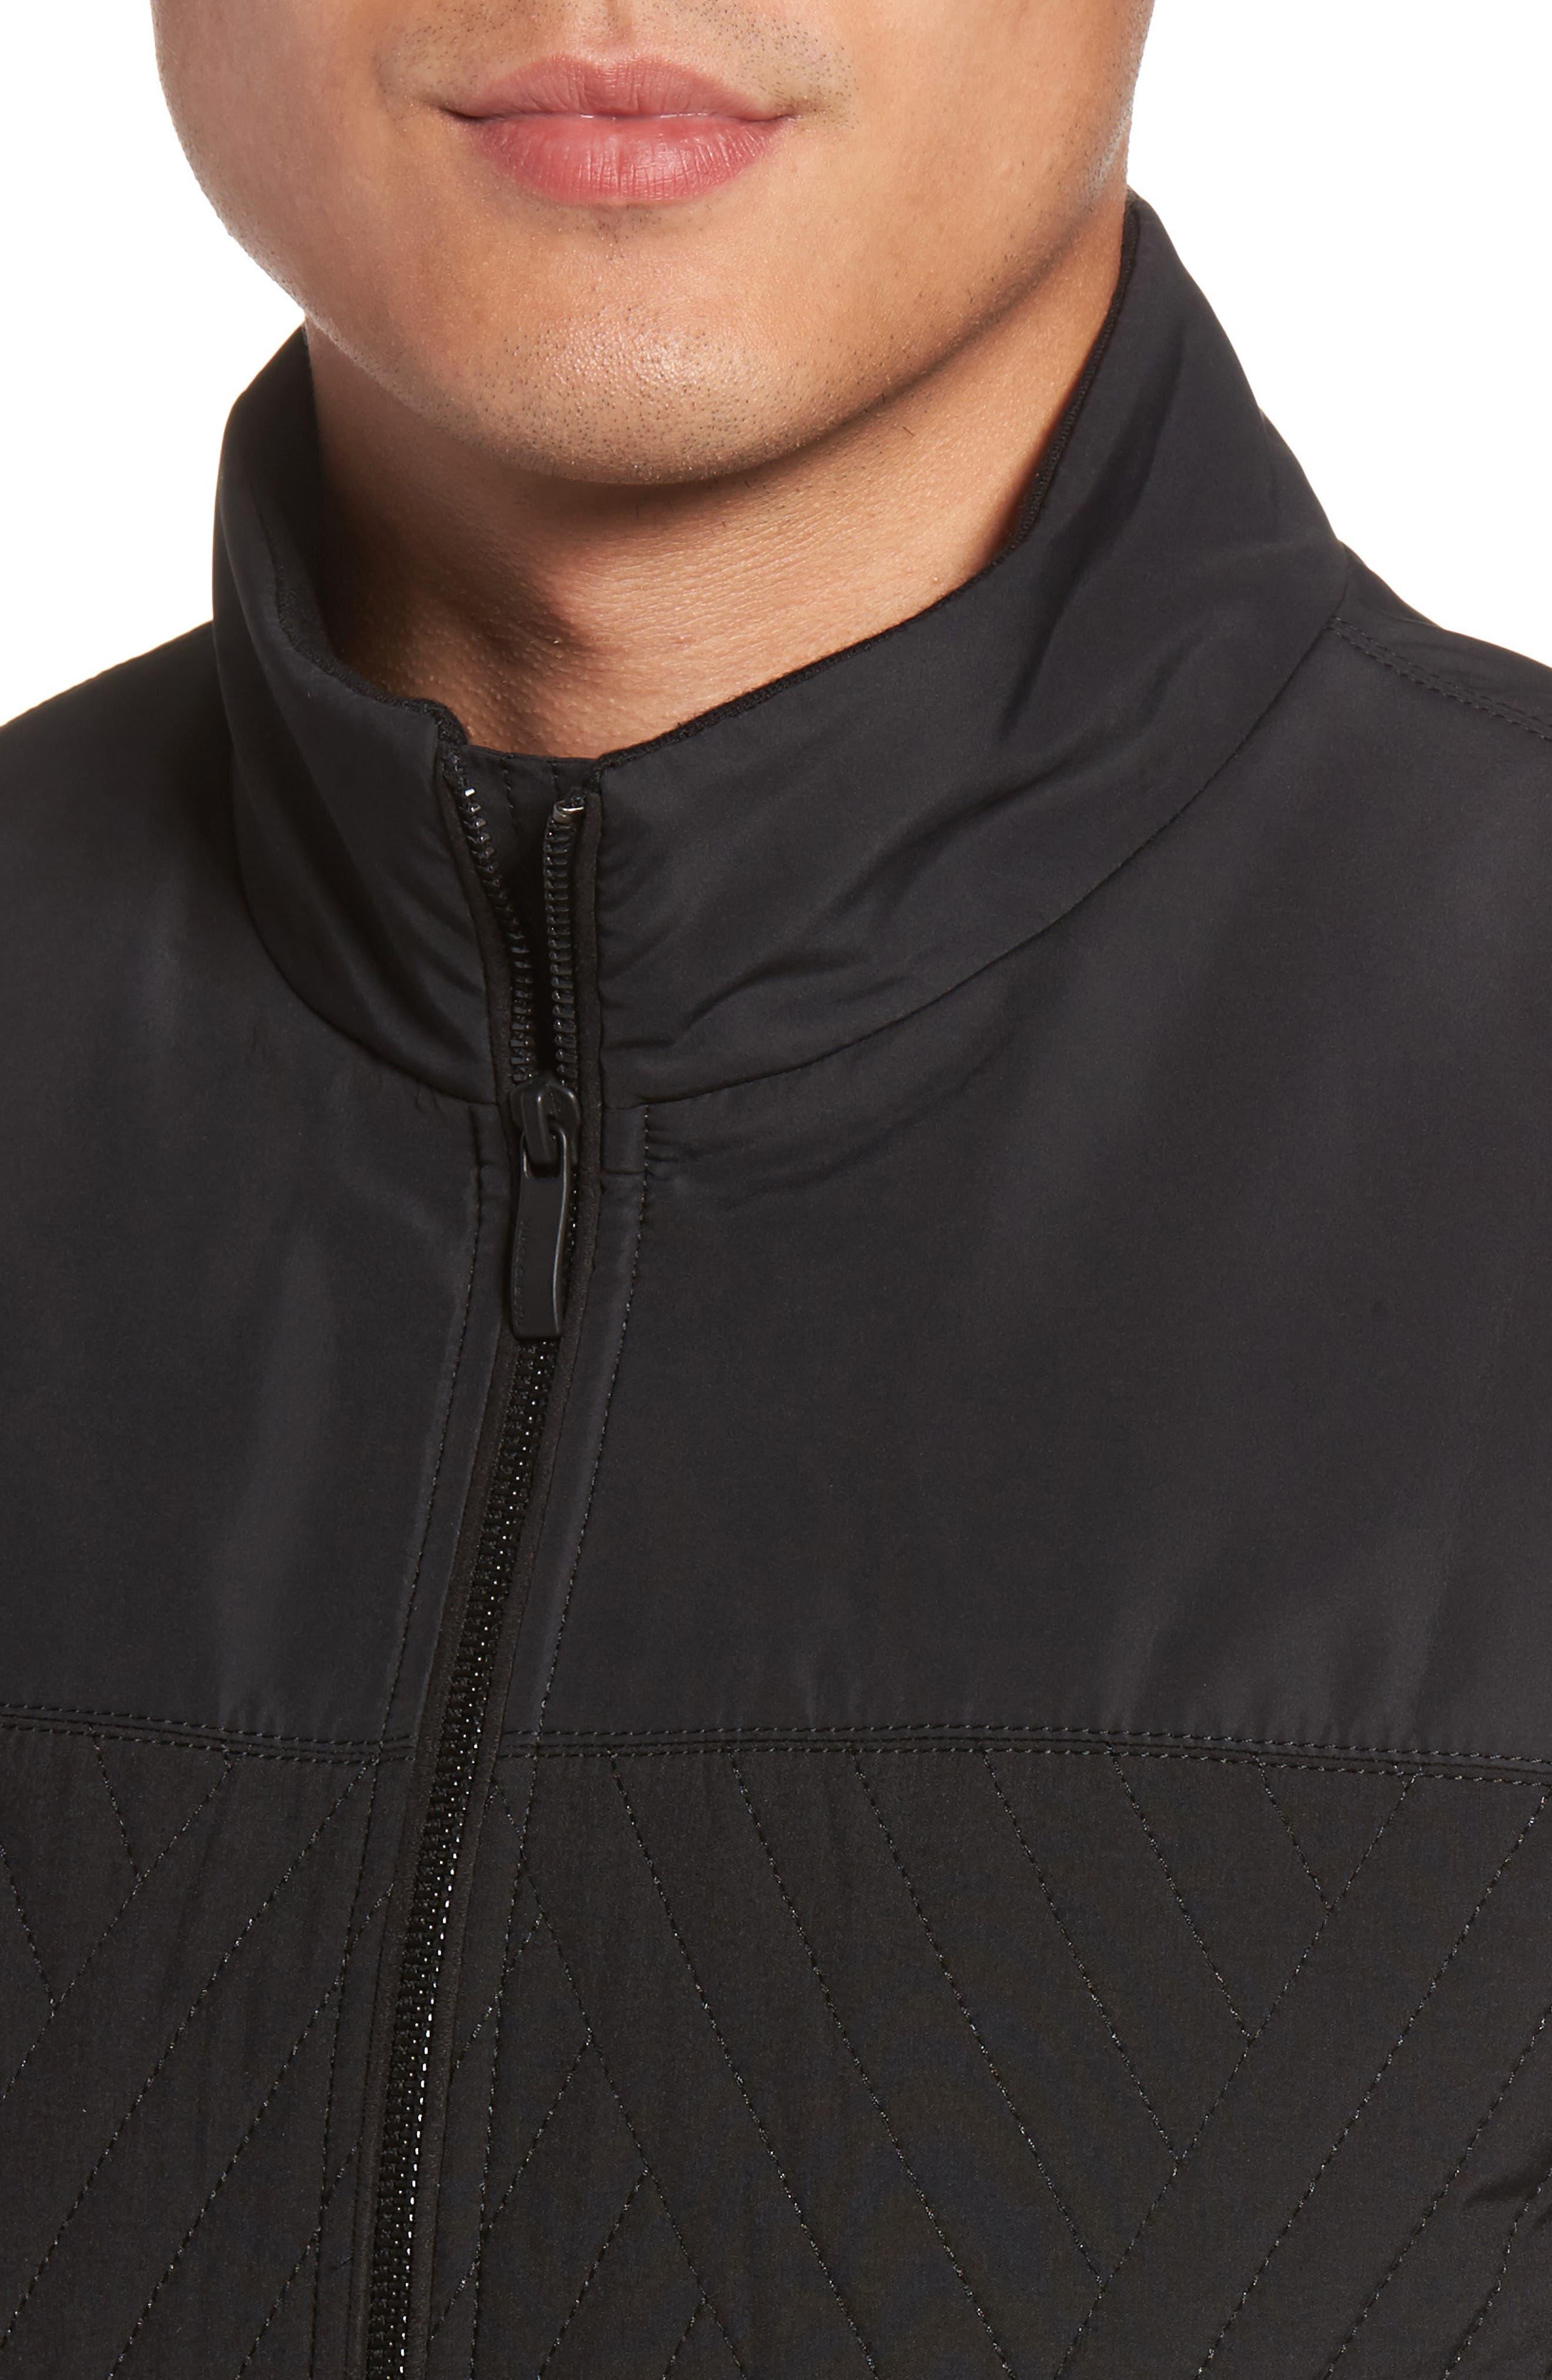 VINCE CAMUTO,                             Slim Fit Quilted Vest,                             Alternate thumbnail 4, color,                             BLACK